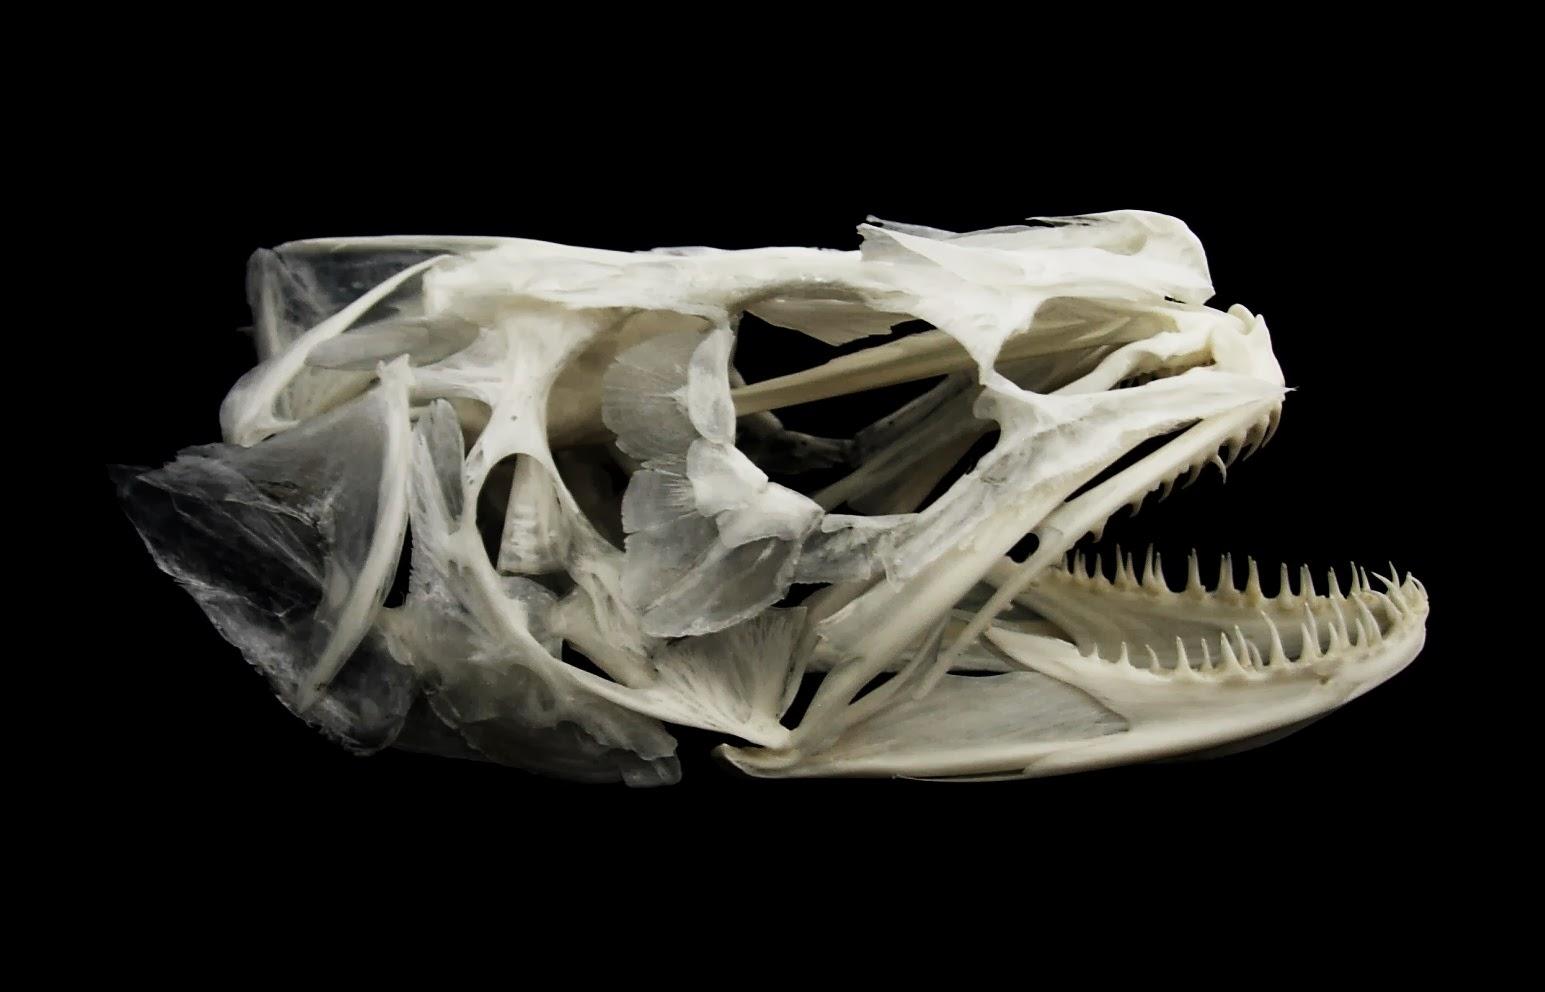 Skulls, bones and fish soup: Sharks, skates and fish heads